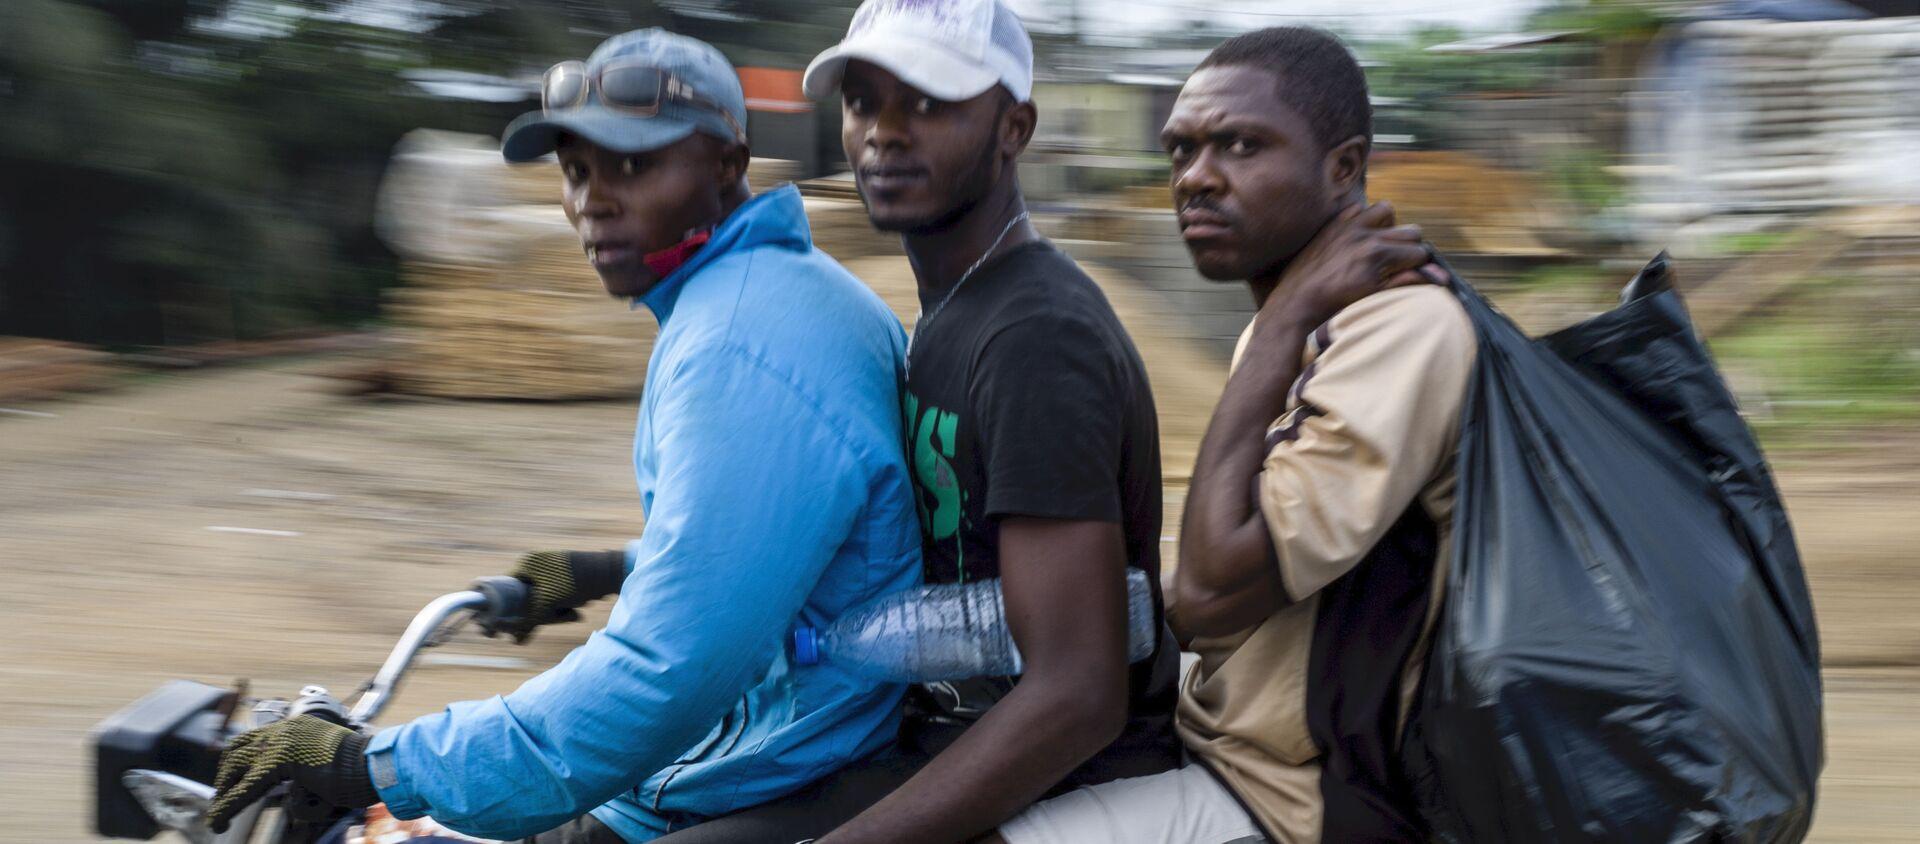 Des jeunes Camerounais à moto - Sputnik France, 1920, 17.10.2019